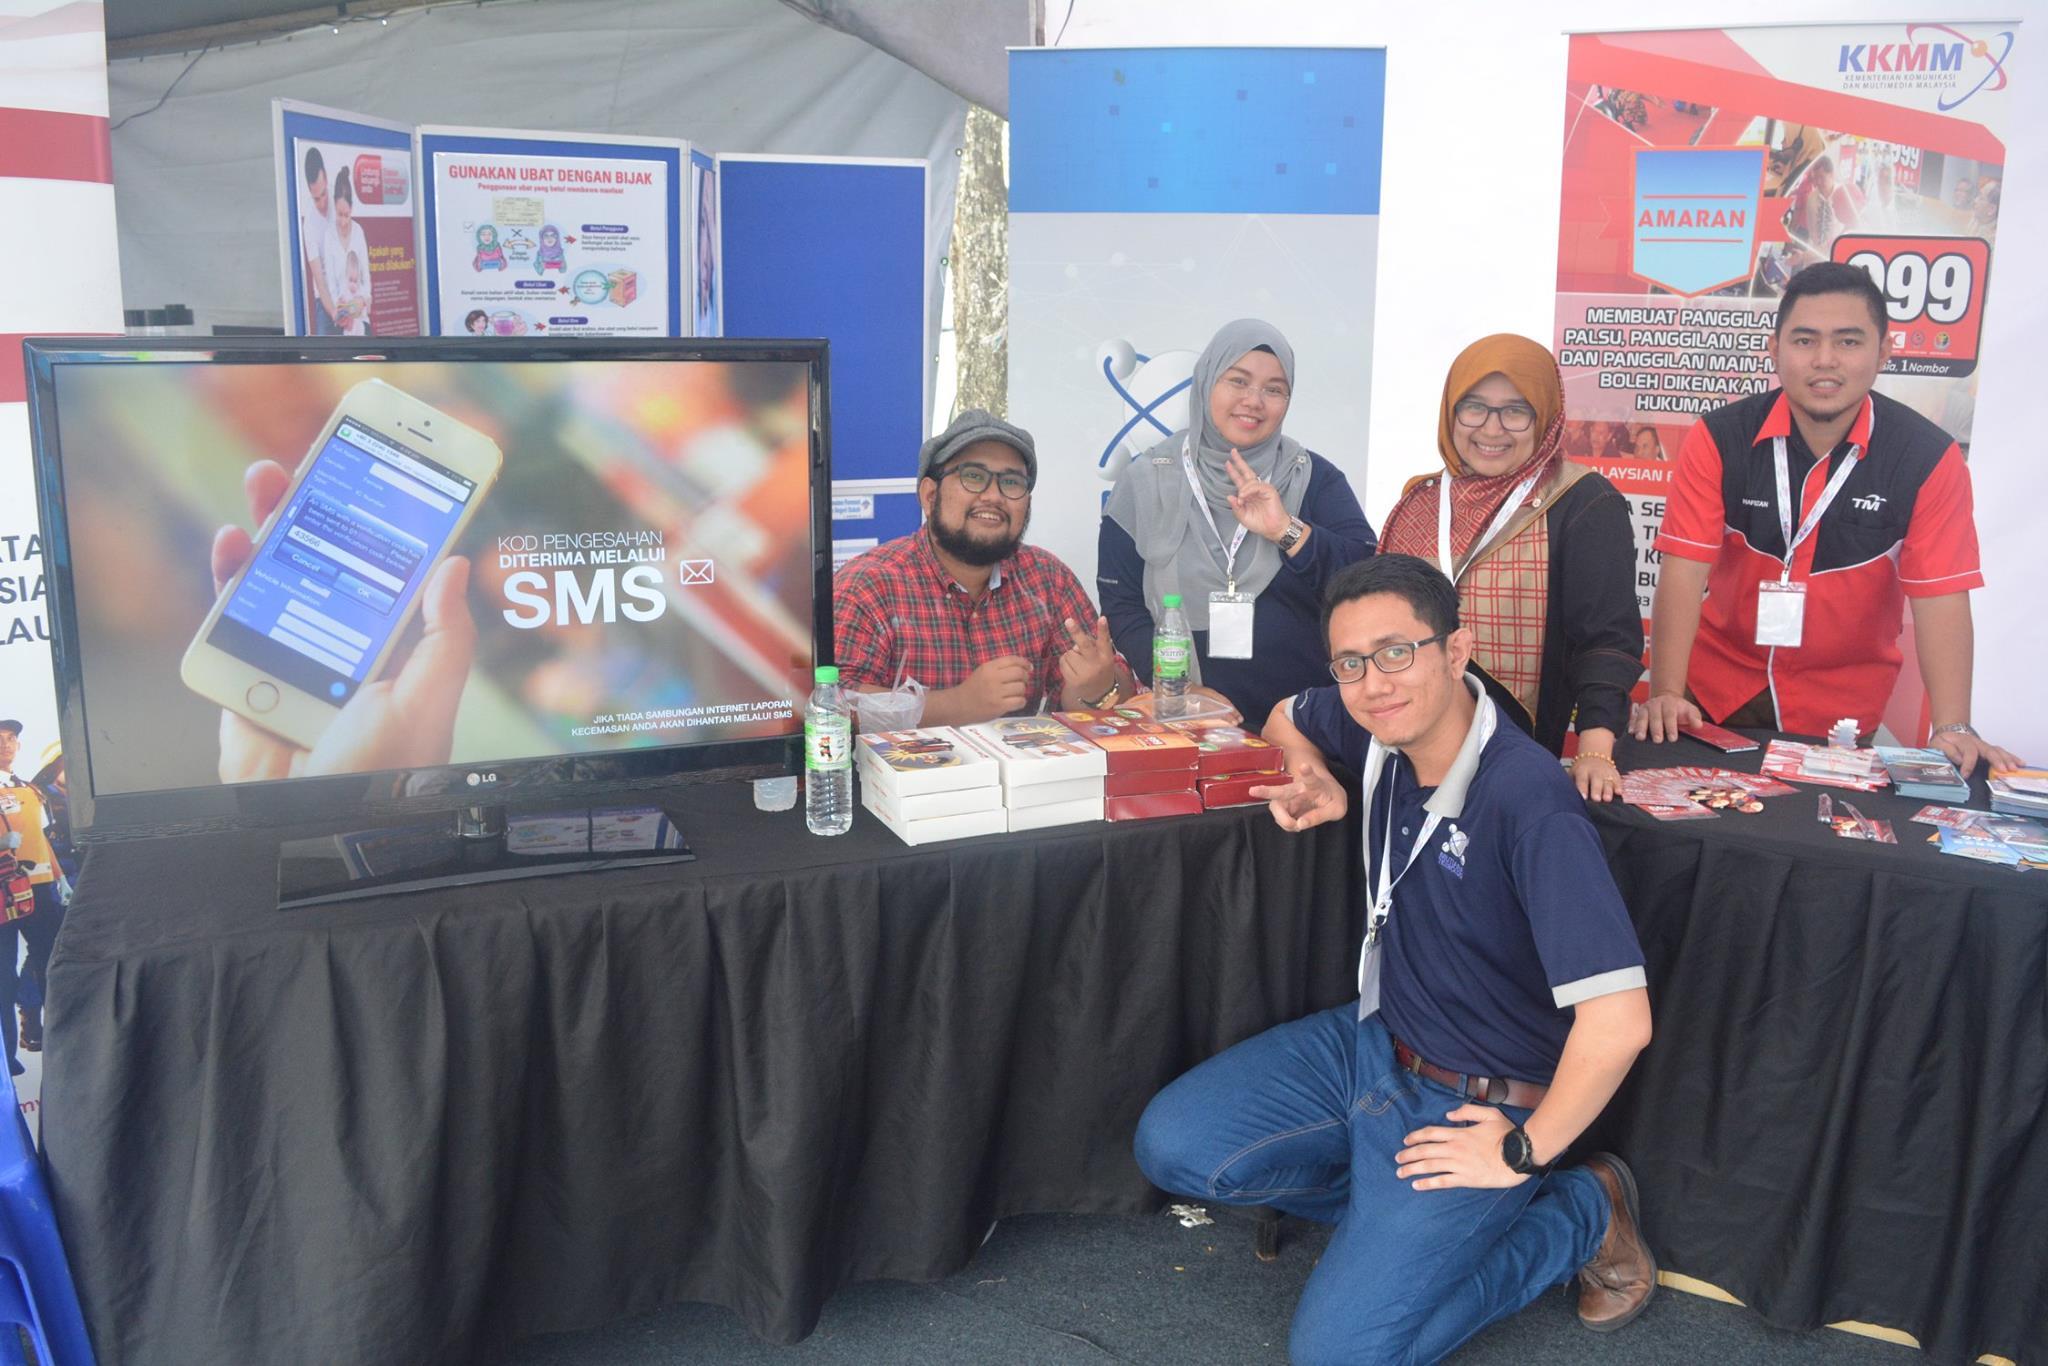 MINDA Exhibition: Hari Malaysia Event 2017